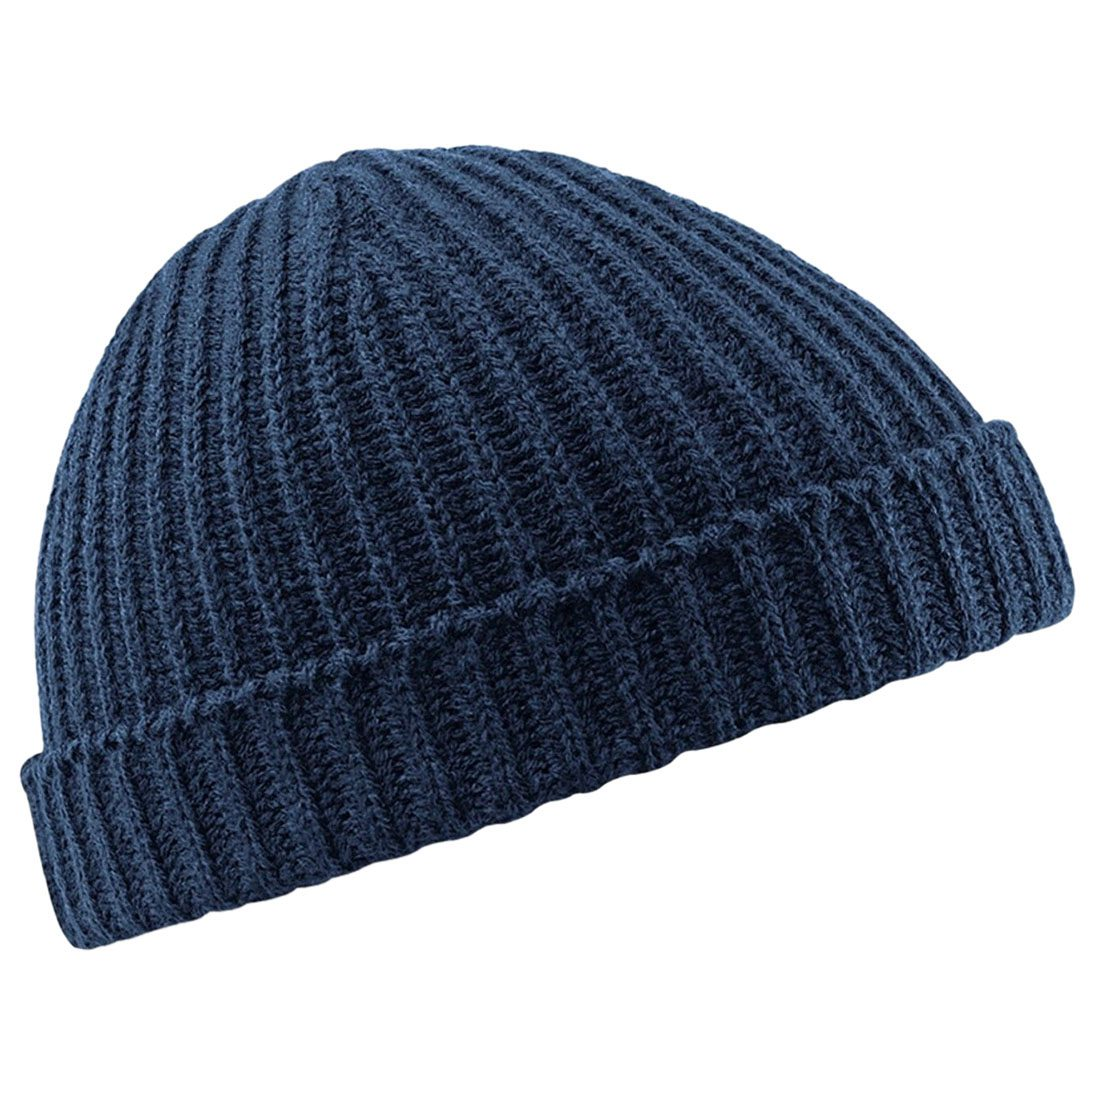 1f8a11c9782 Dropwow Fisherman Beanie Ribbed Hat Winter Warm Turn Up Retro Mens Womens  Ladies